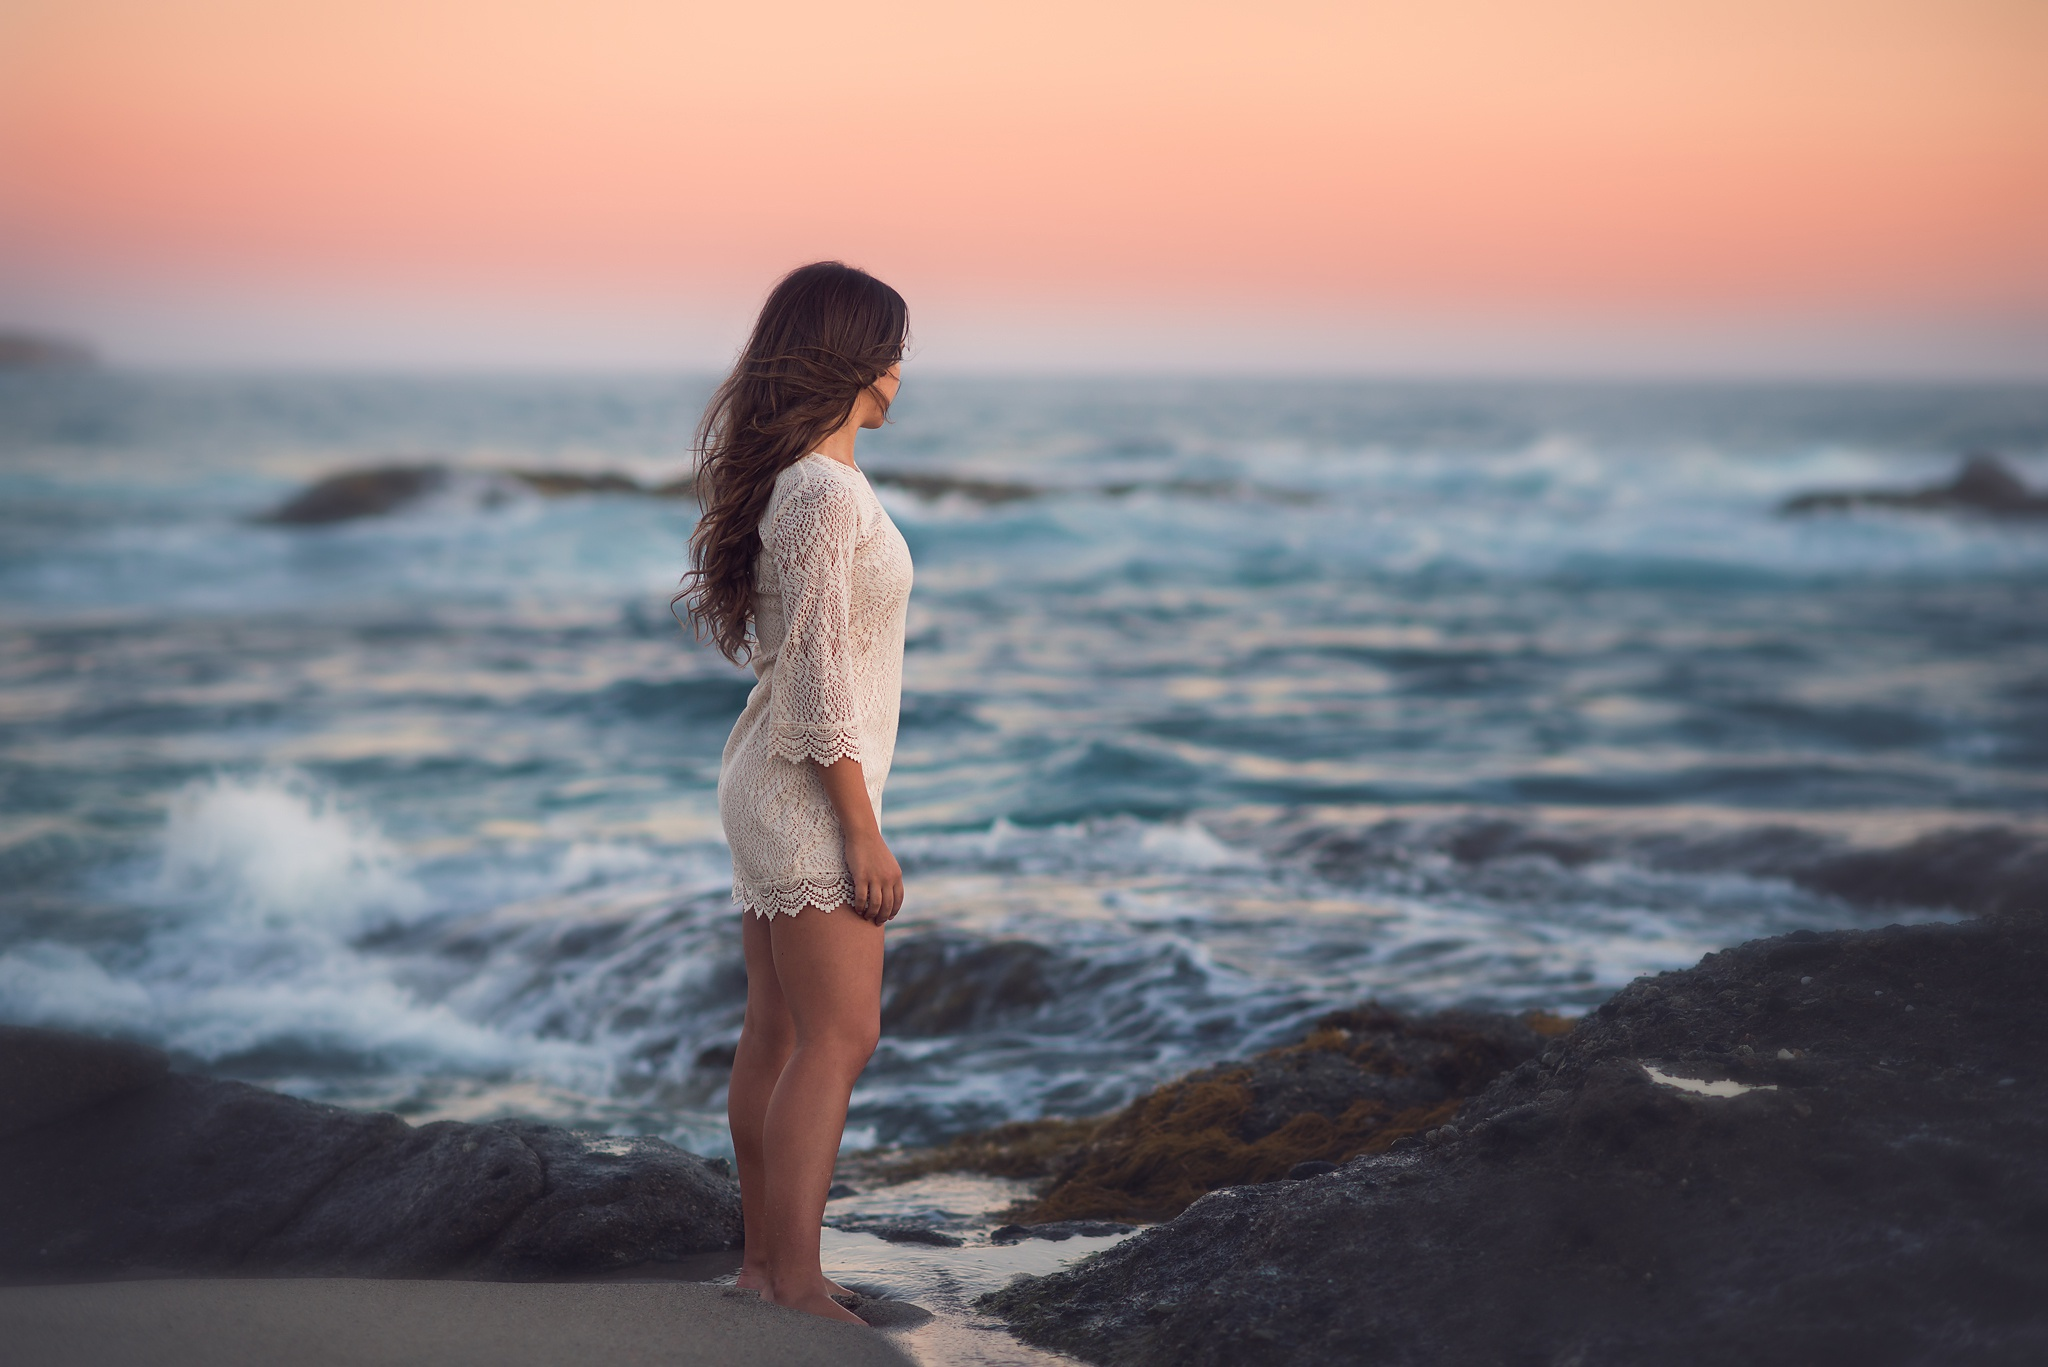 Картинка девушка на берегу моря спиной